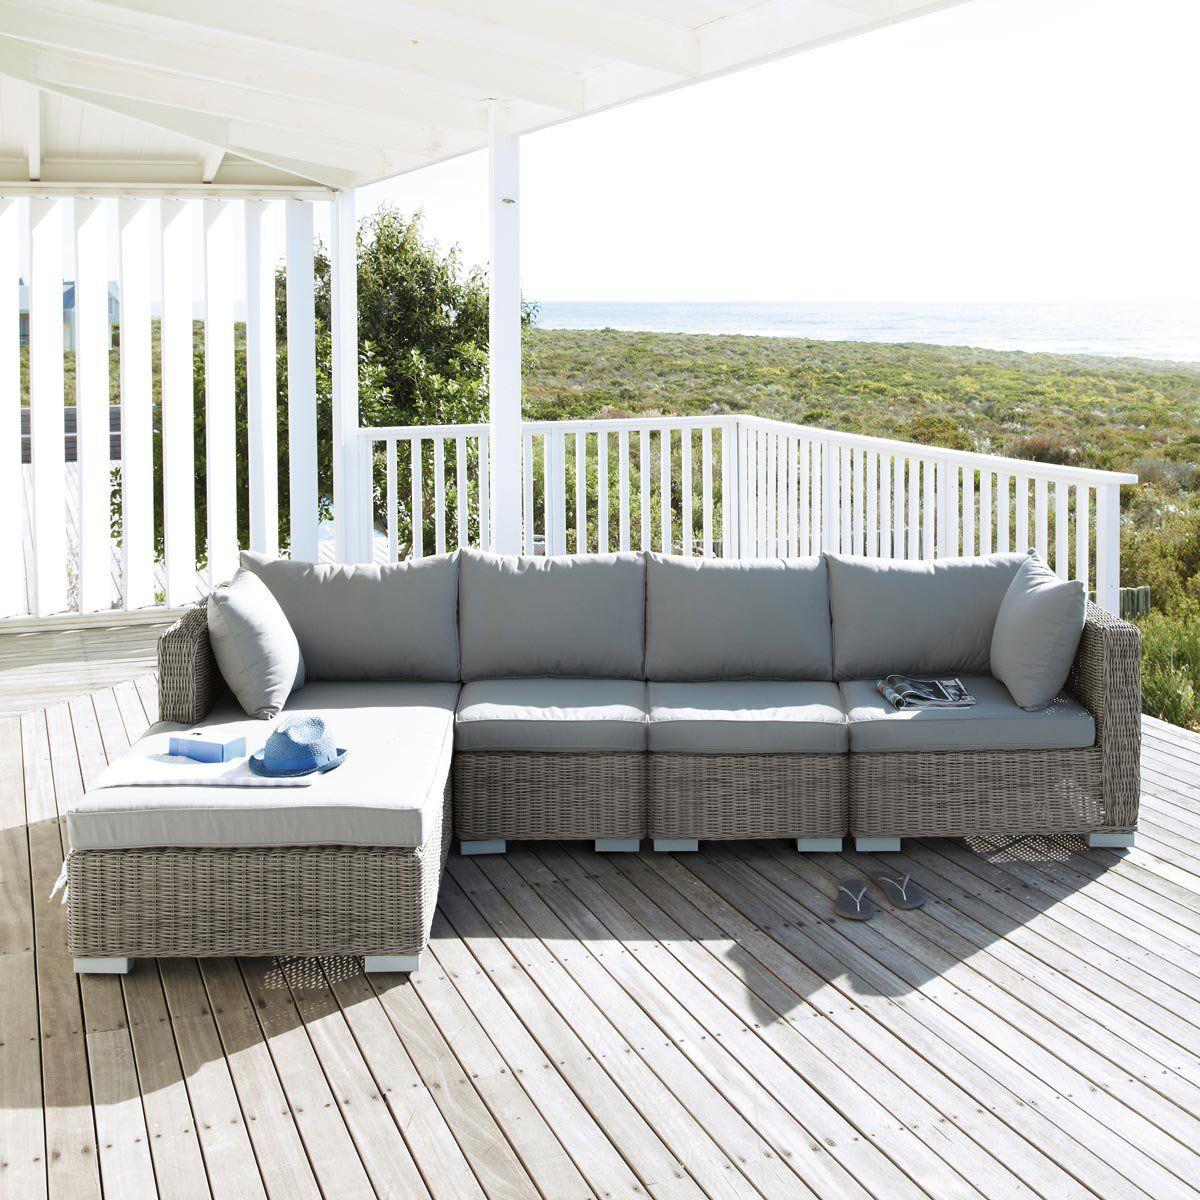 Pouf de jardin en résine tressée grise | Gartensofa, Outdoor ...